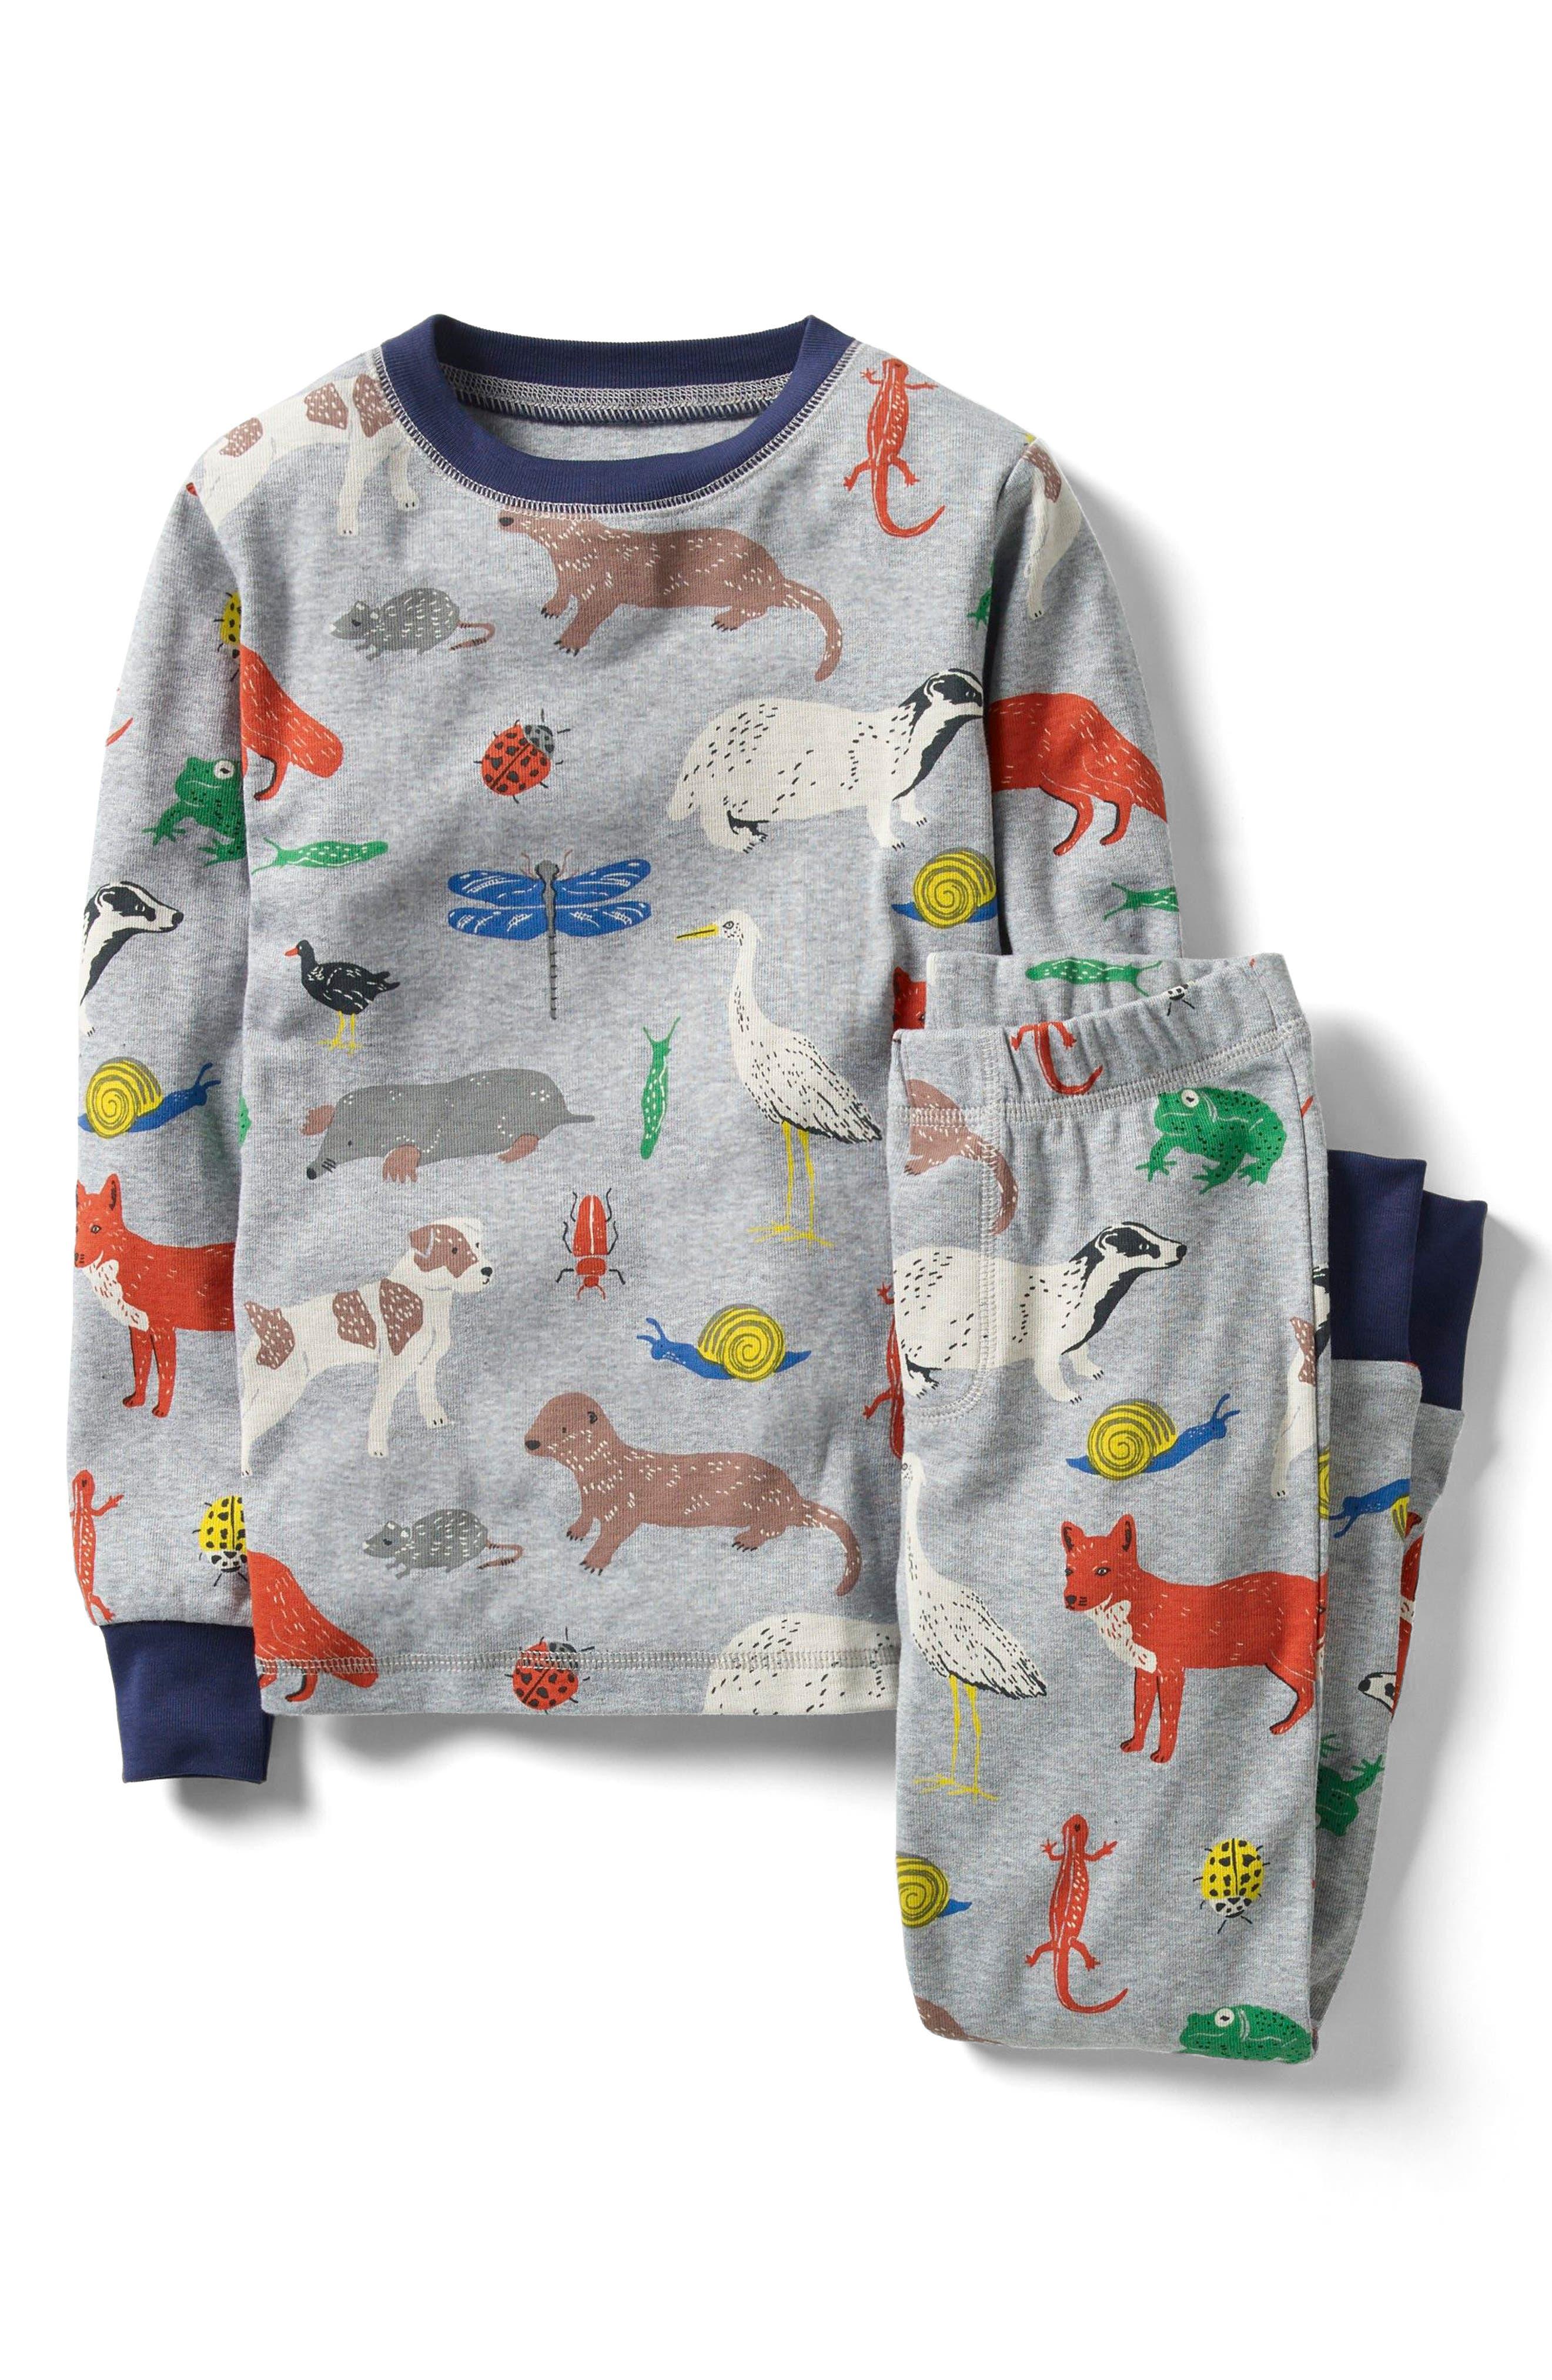 Cosy Long Johns Fitted Two-Piece Pajamas,                             Main thumbnail 1, color,                             Grey Marl River Folk